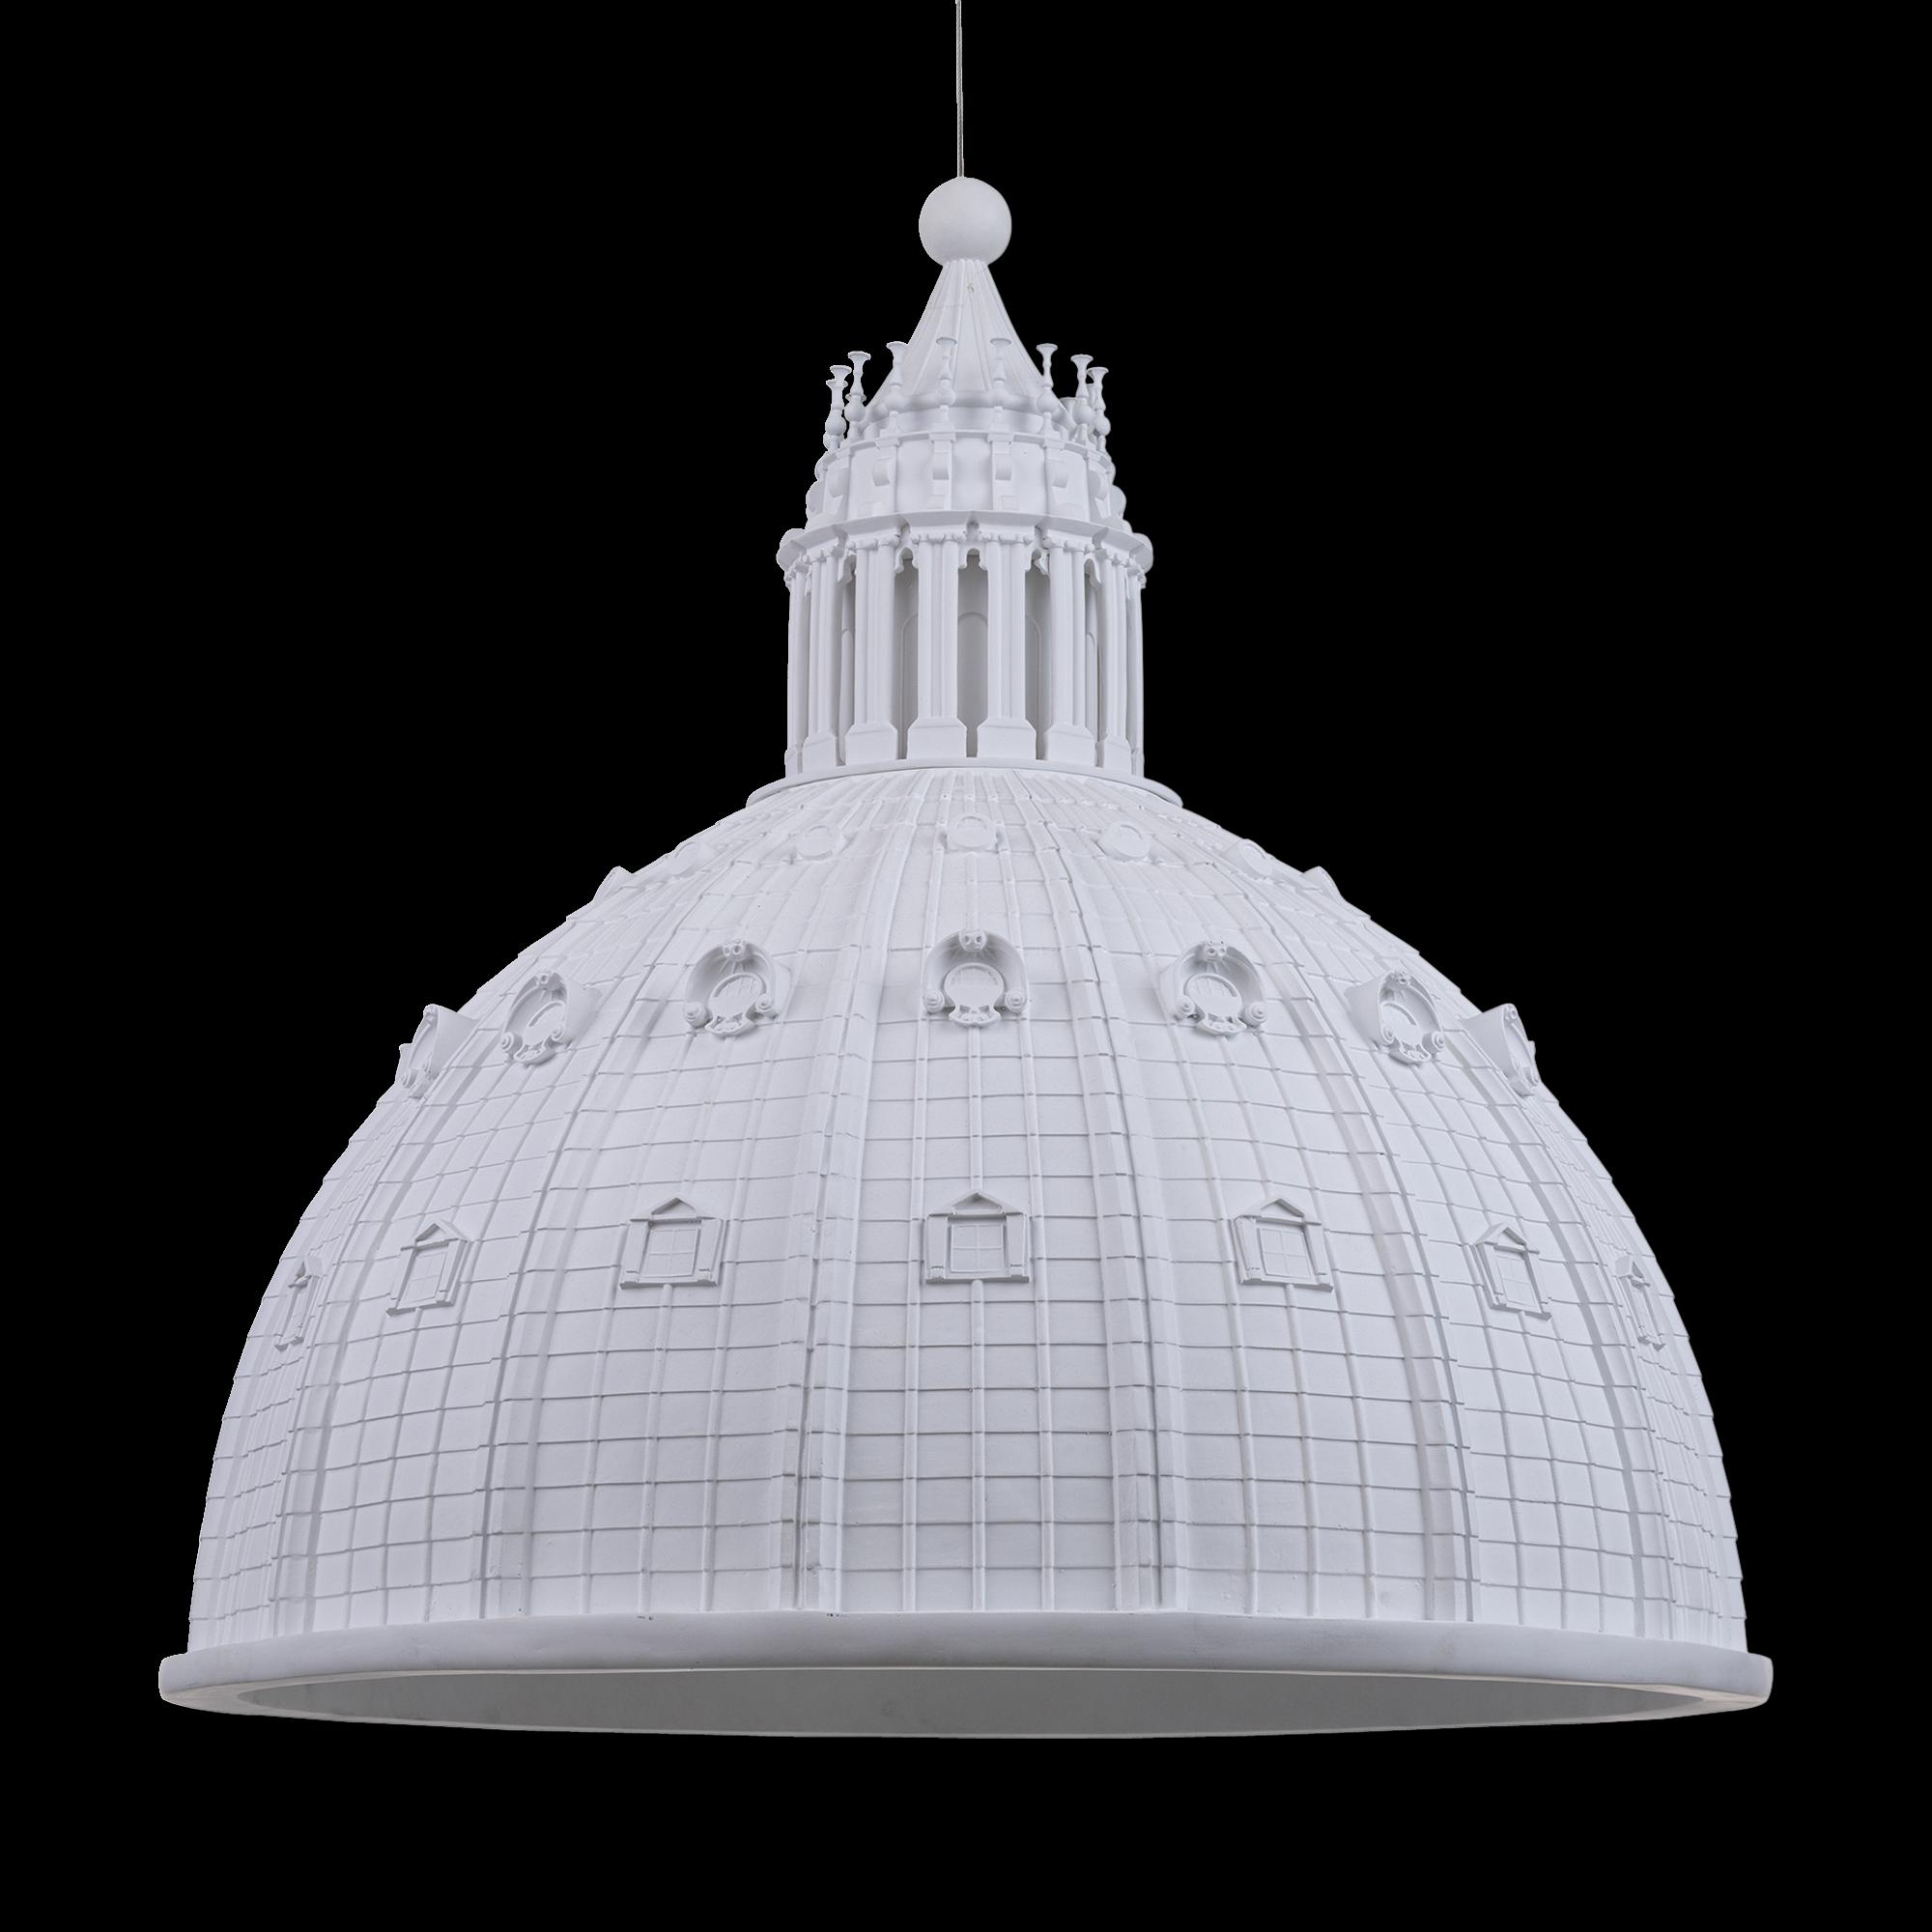 seletti-cupolone-lamp-white-1